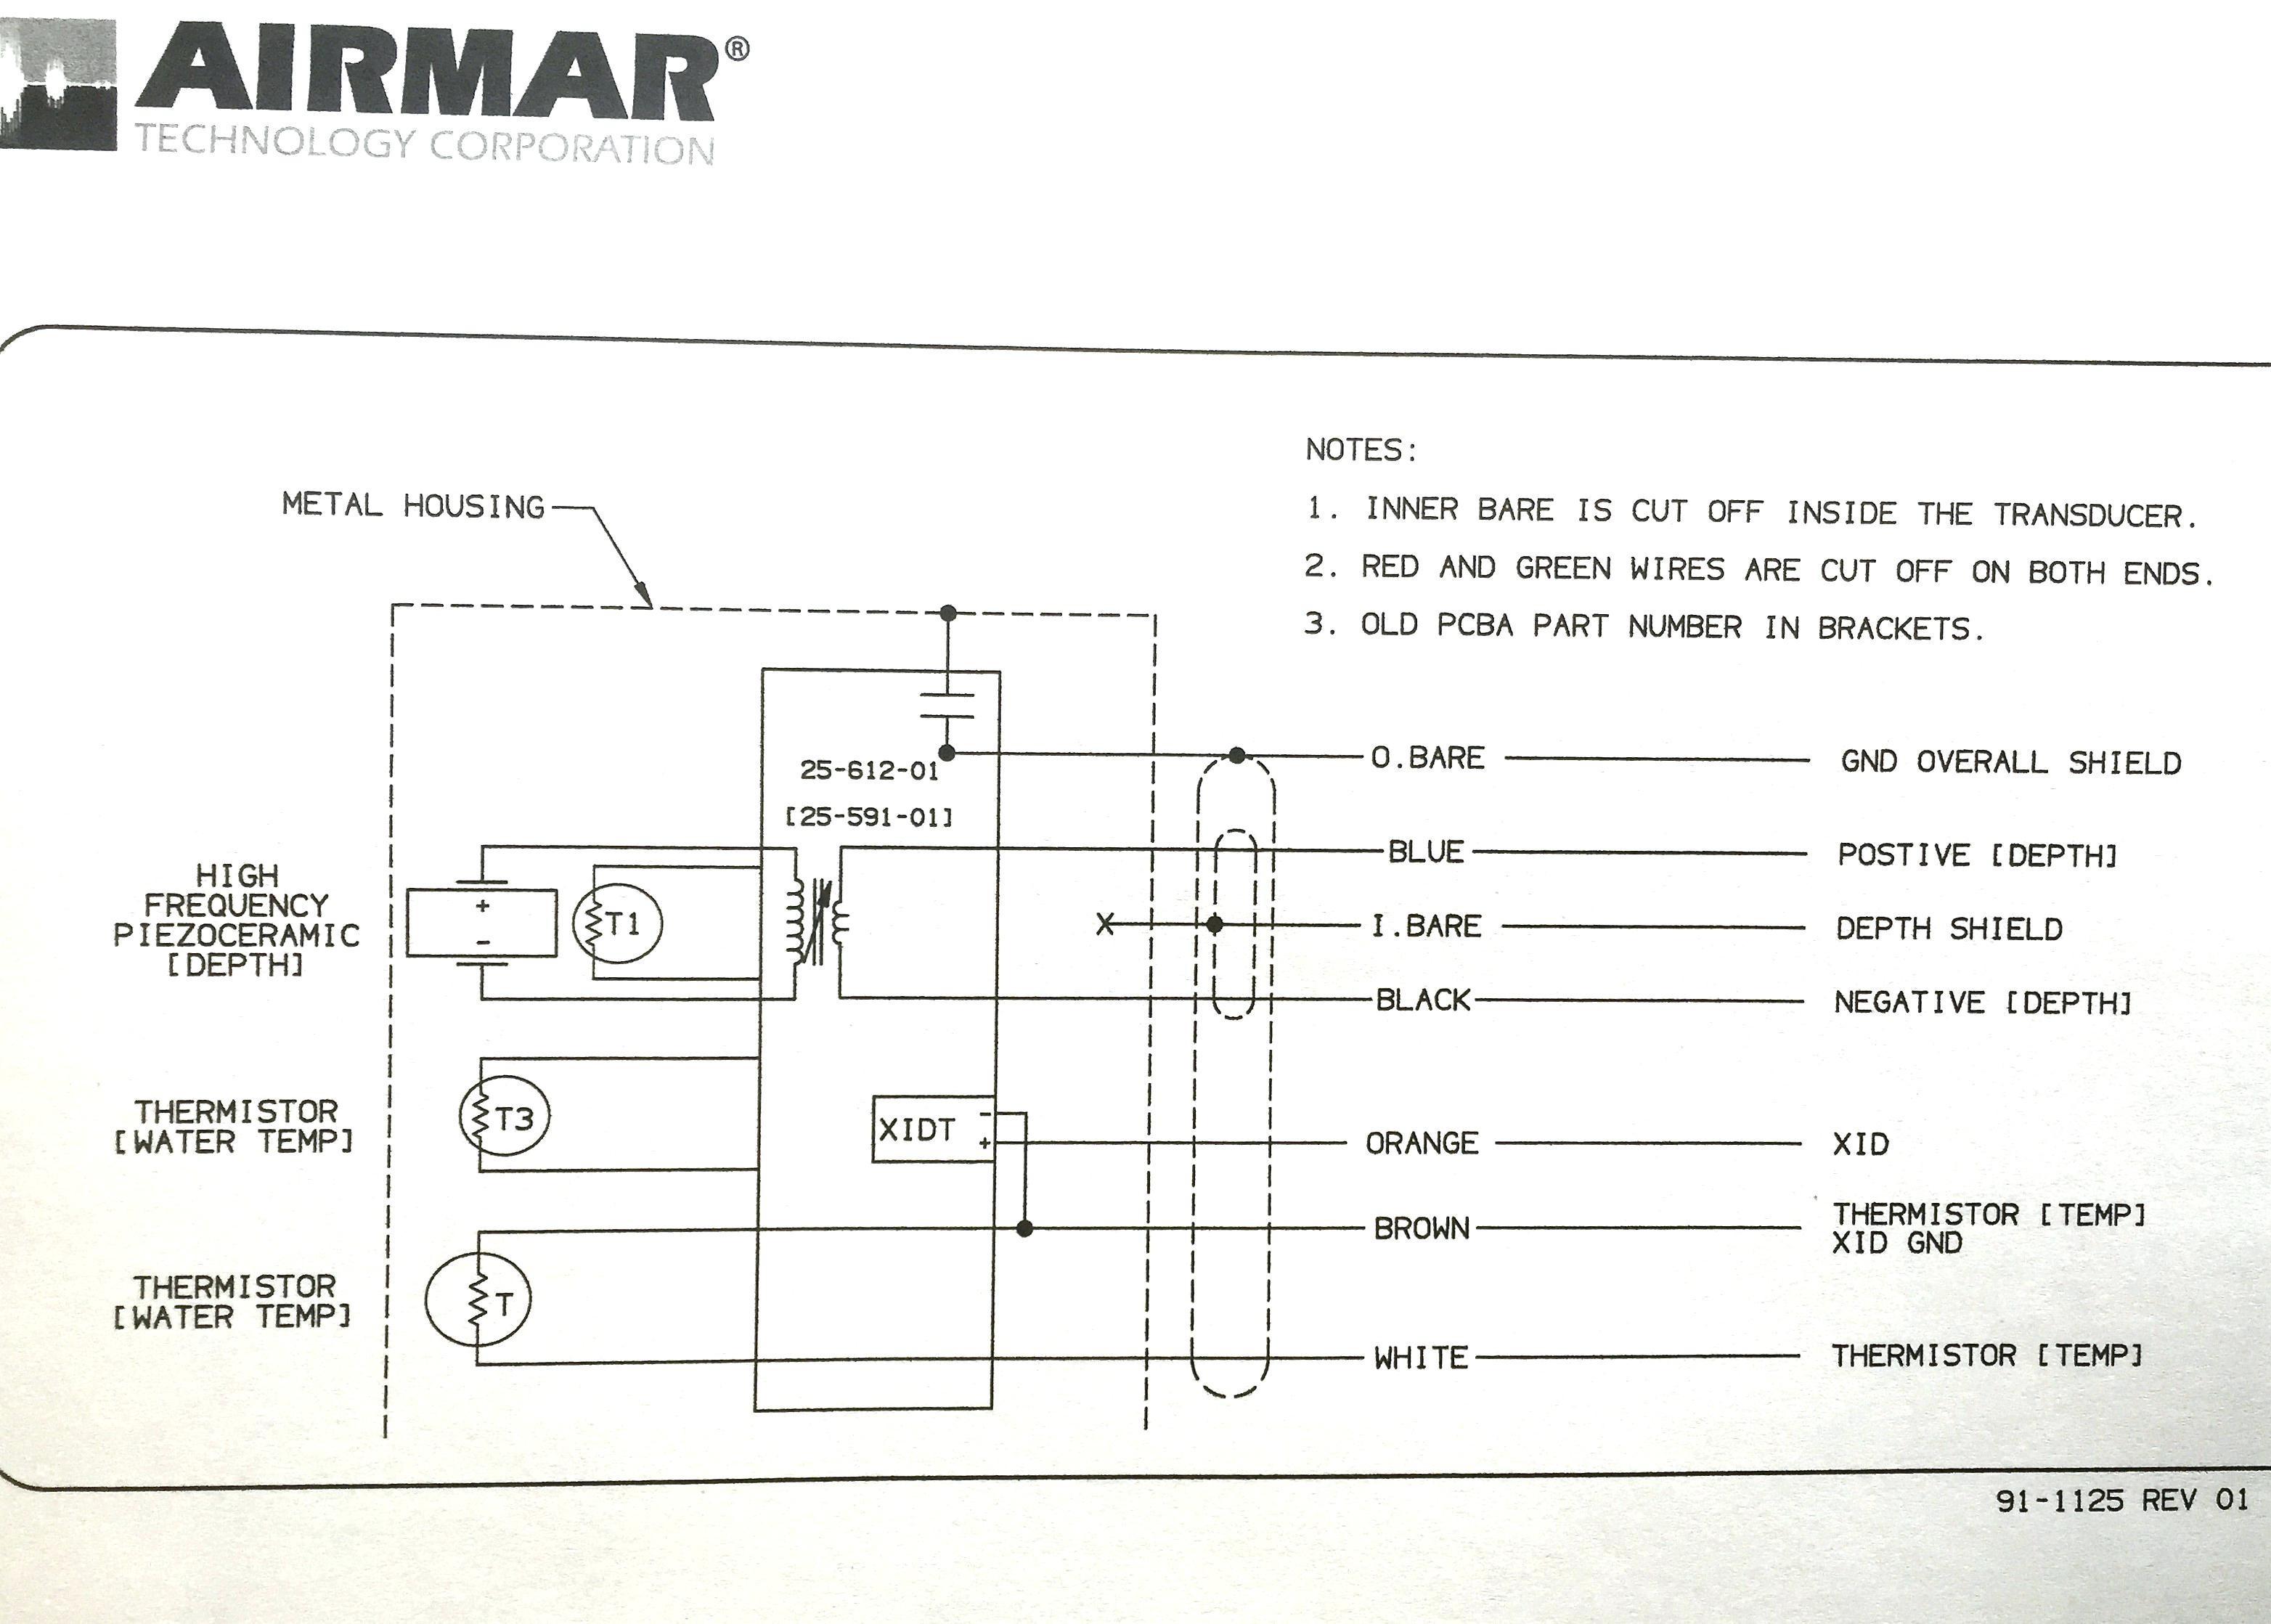 Garmin Transducer Wiring Diagram Garmin Wiring Diagram 3210 Antenna Gps Diagrams Radar 8 Pin Of Garmin Transducer Wiring Diagram